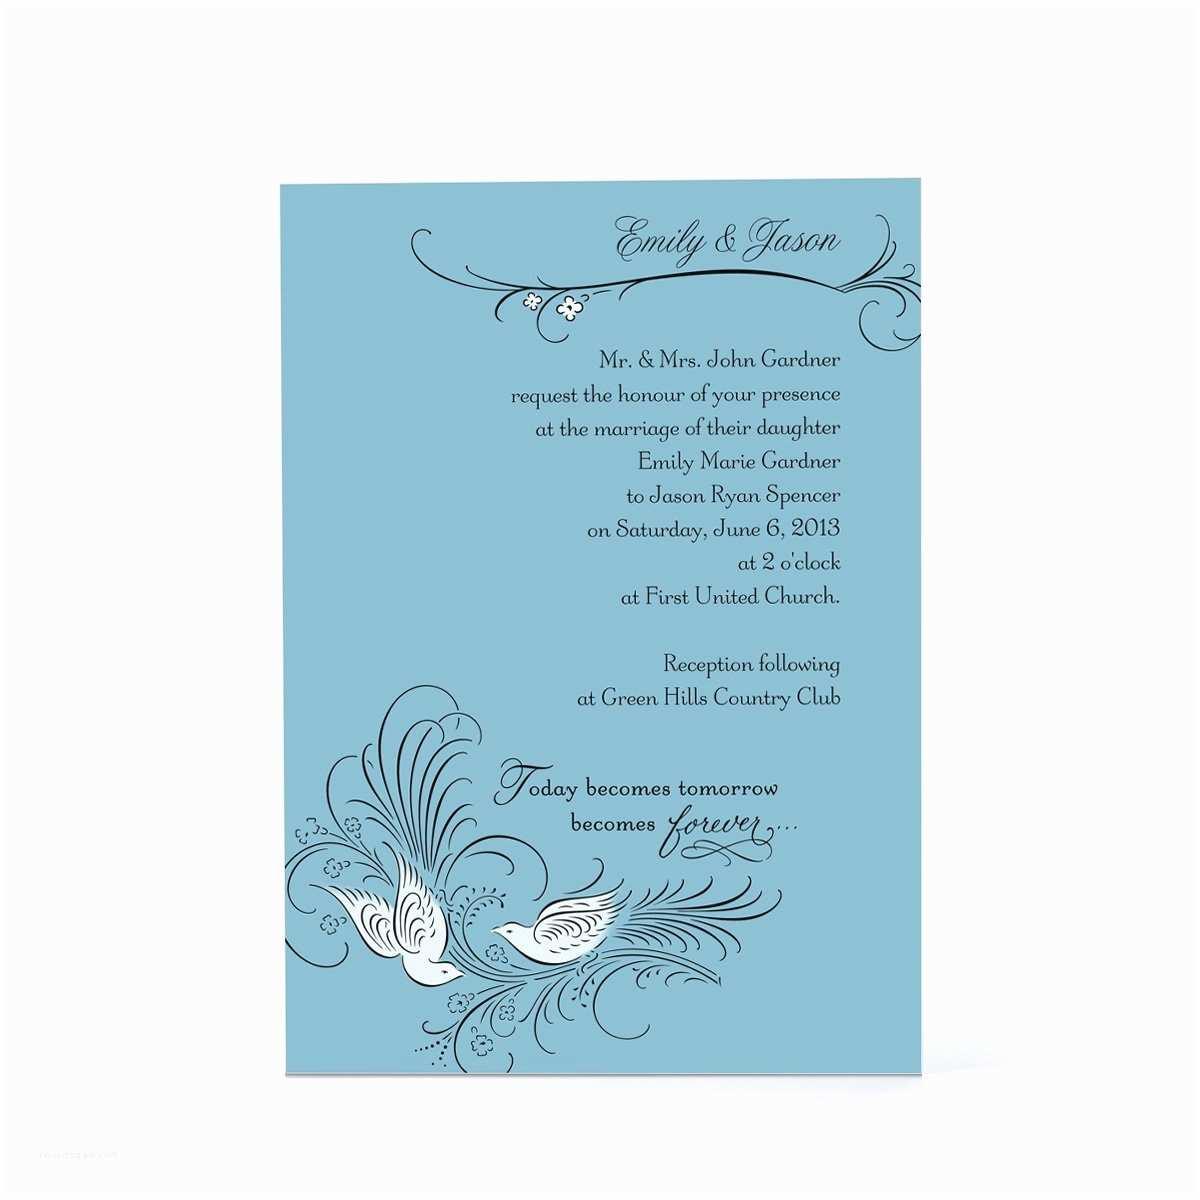 Wedding S To Print At Home For Free Hallmark Free Printable Wedding